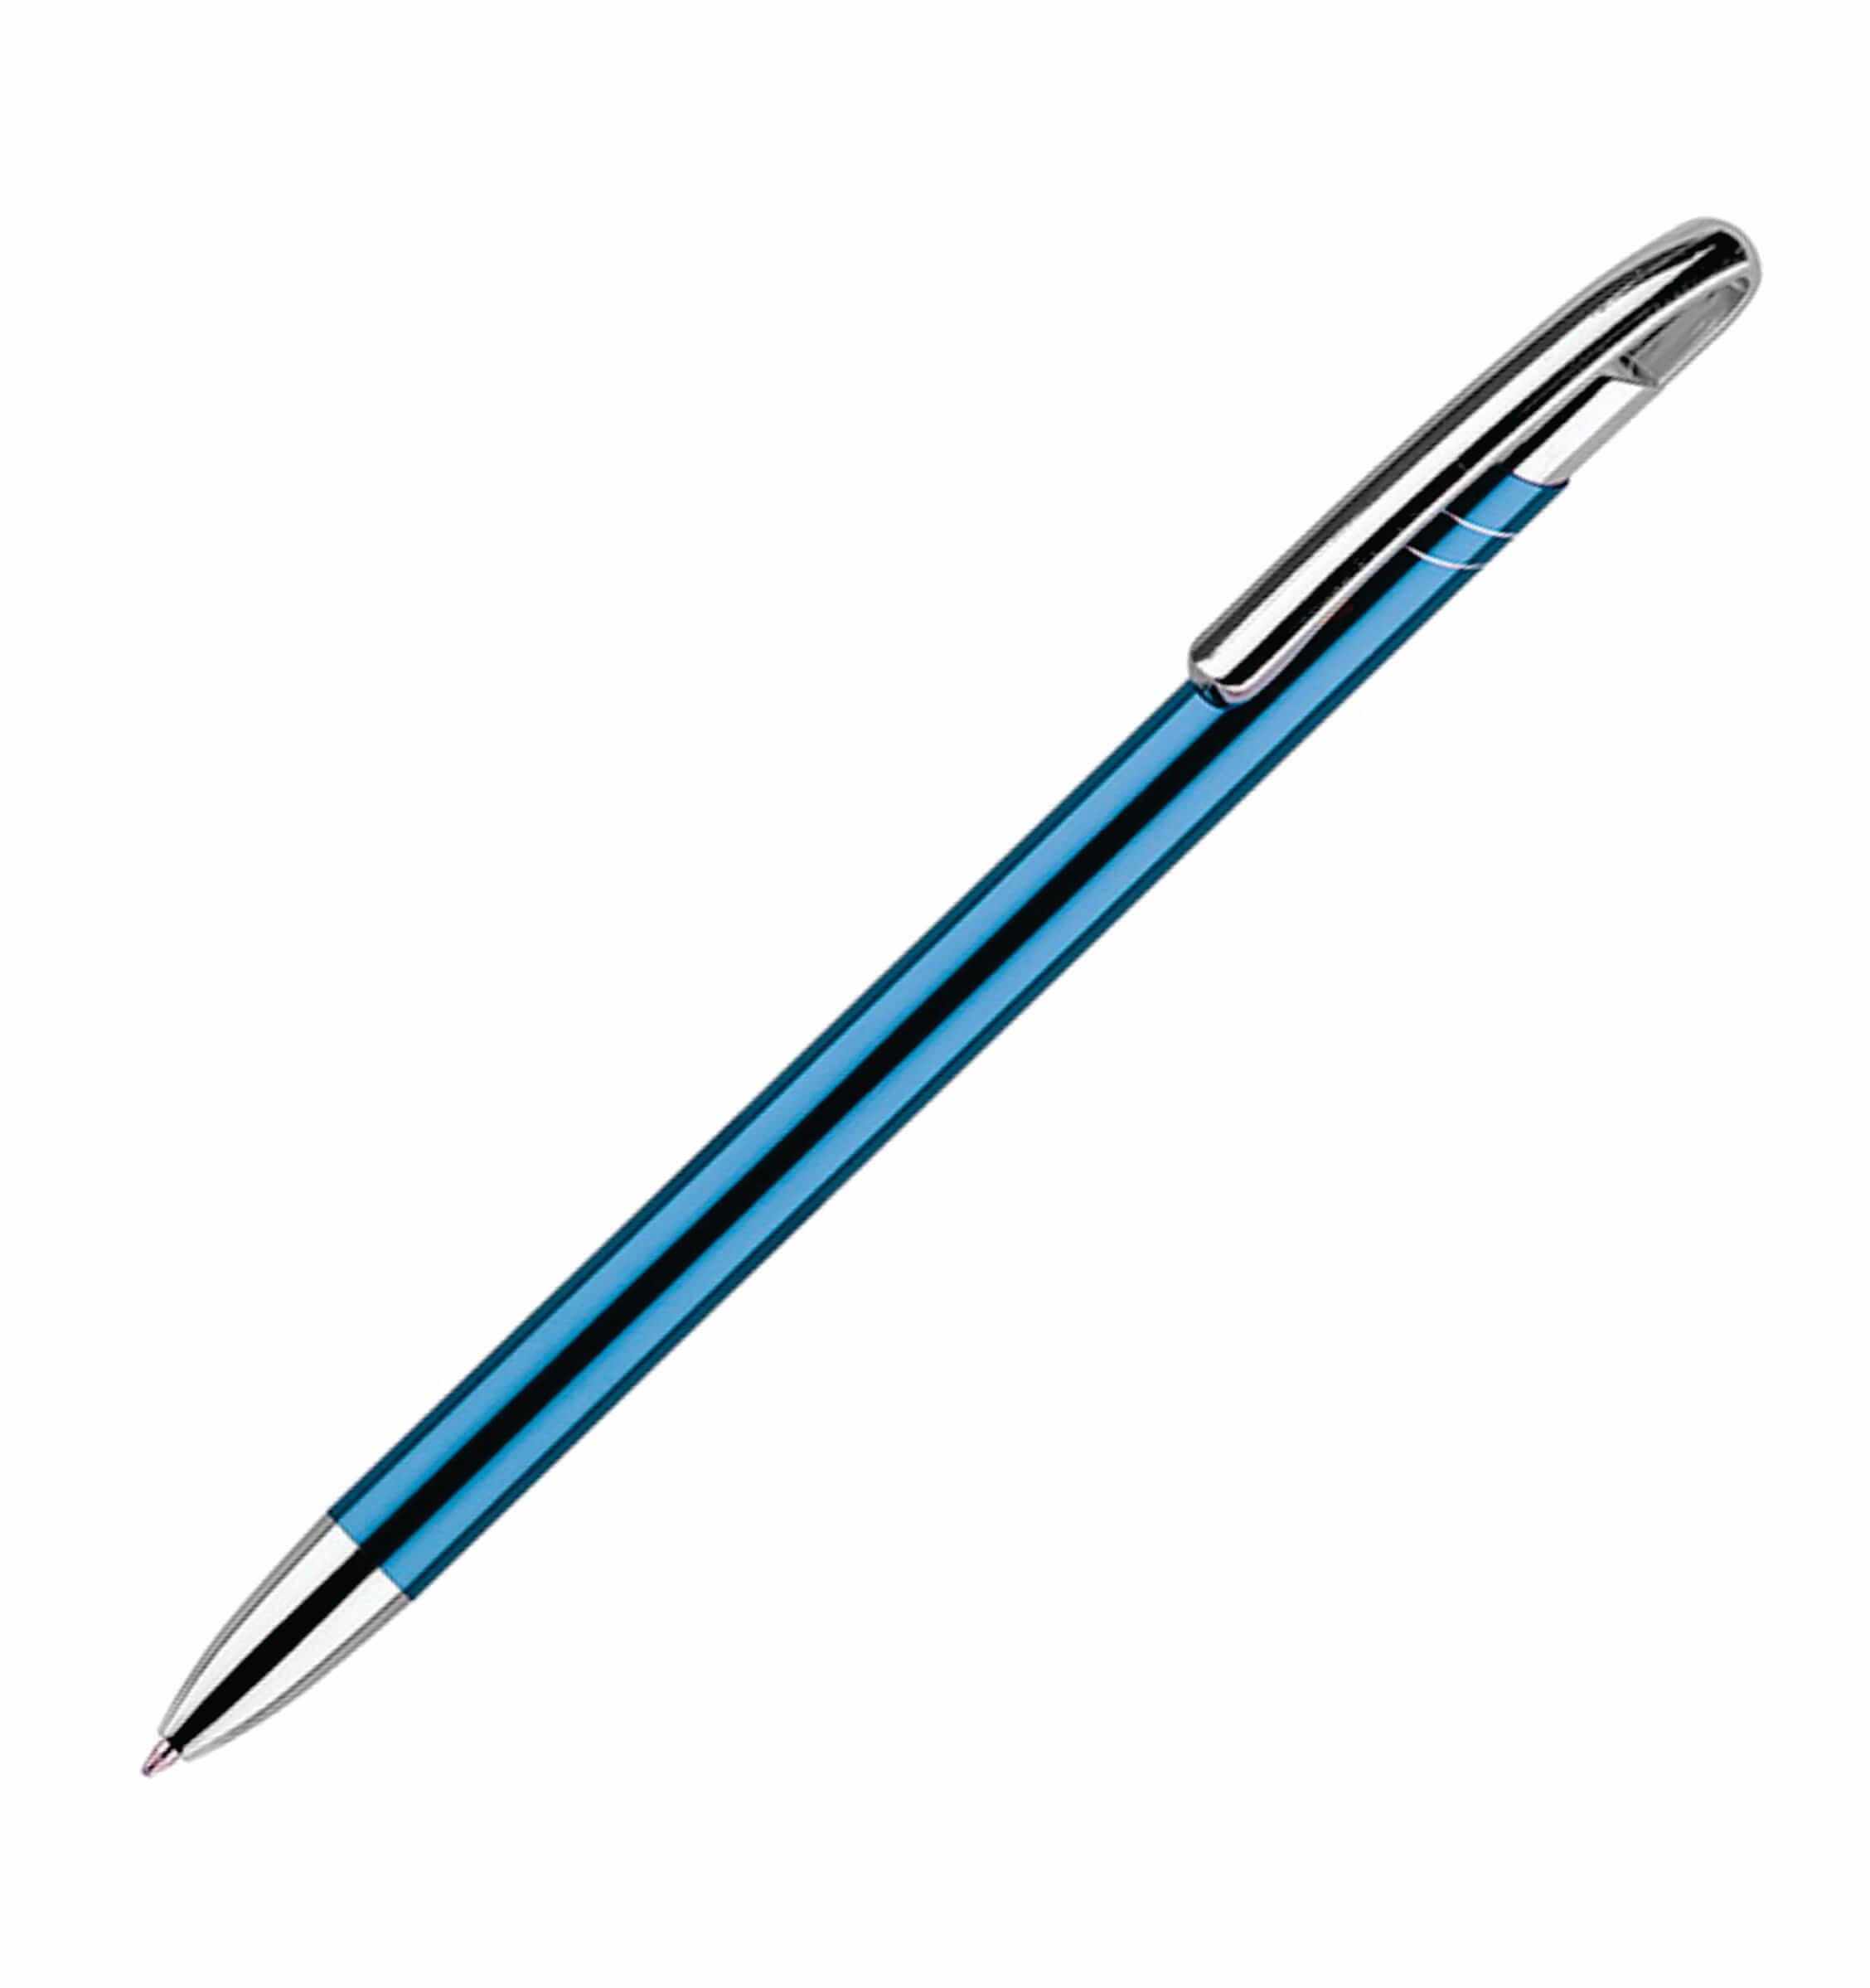 pix metalic avalo albastru deschis